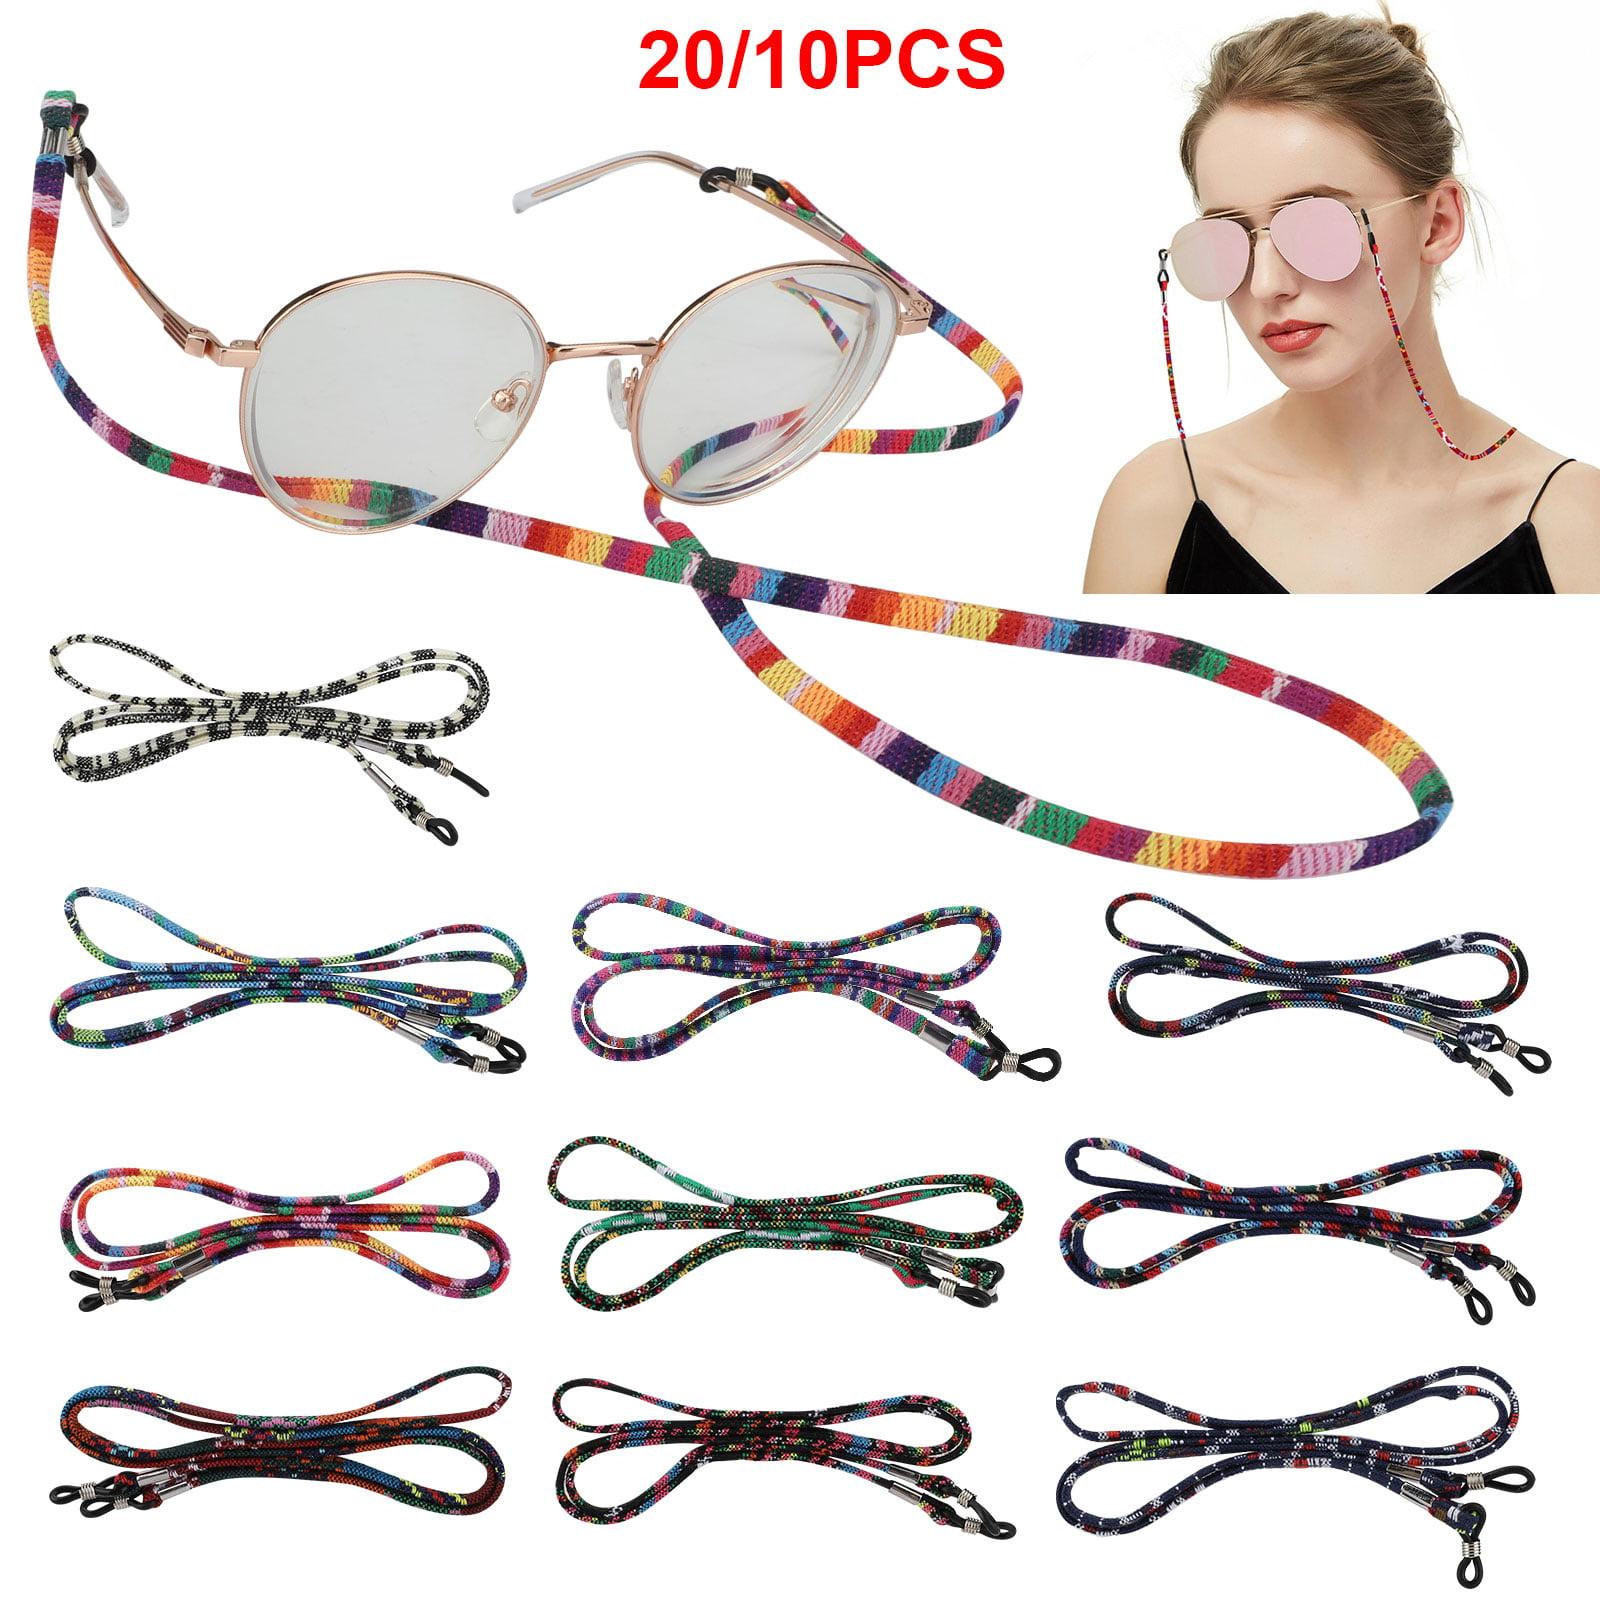 10 Colors Glasses Cord Lanyard Bekith 20 Pack Eyeglasses Strap Cord Premium Sunglasses Eyewear Retainer